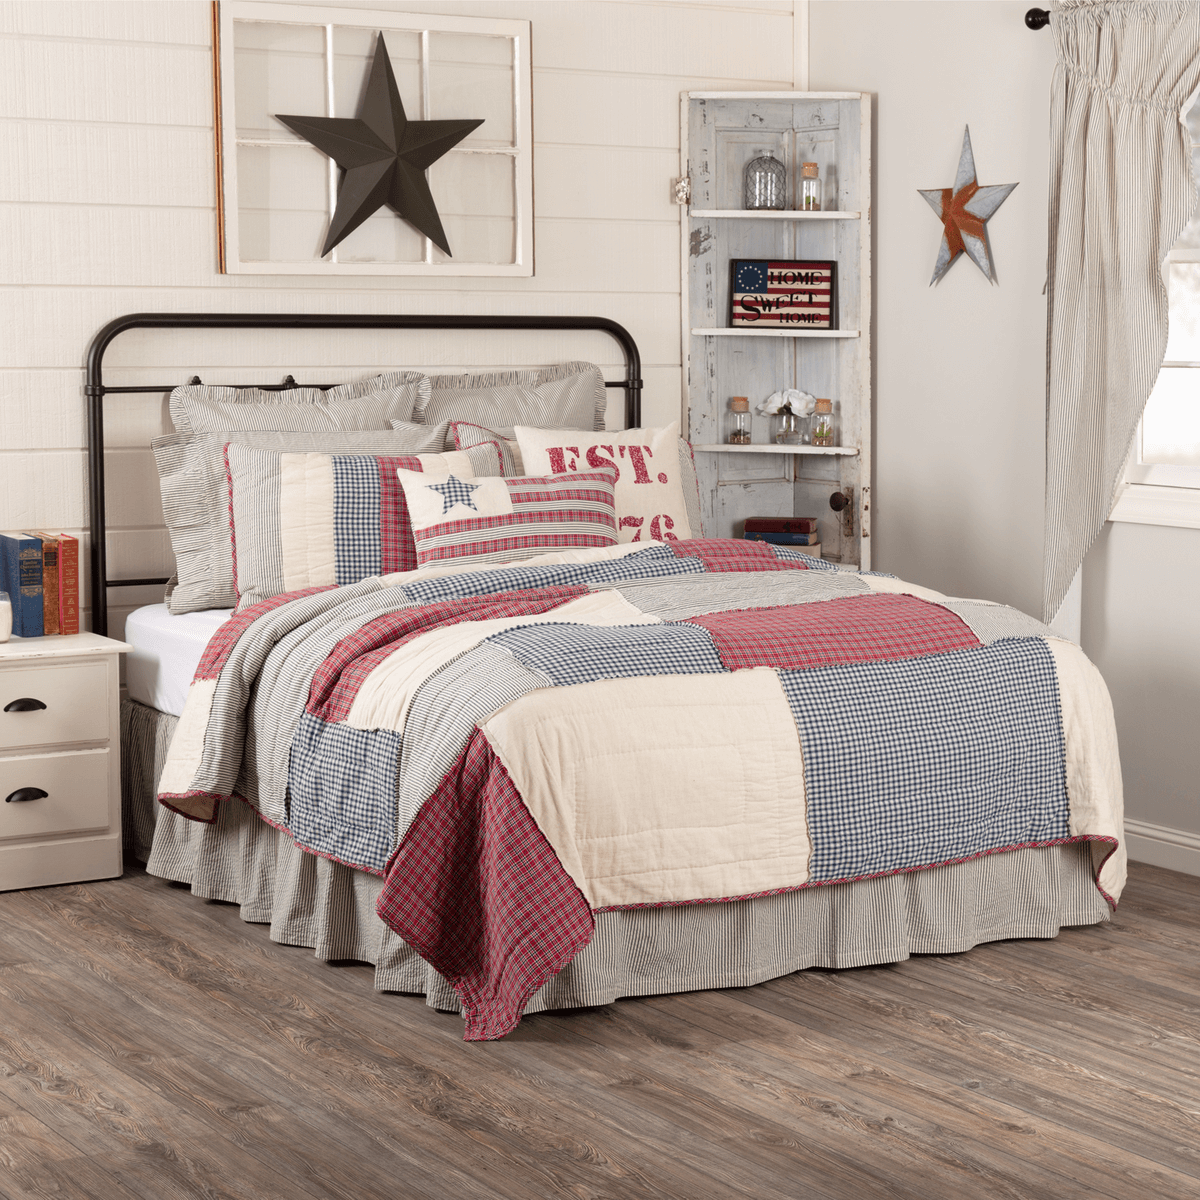 Hatteras Patch Luxury King Quilt Set Teton Timberline Trading Patriotic Bedding